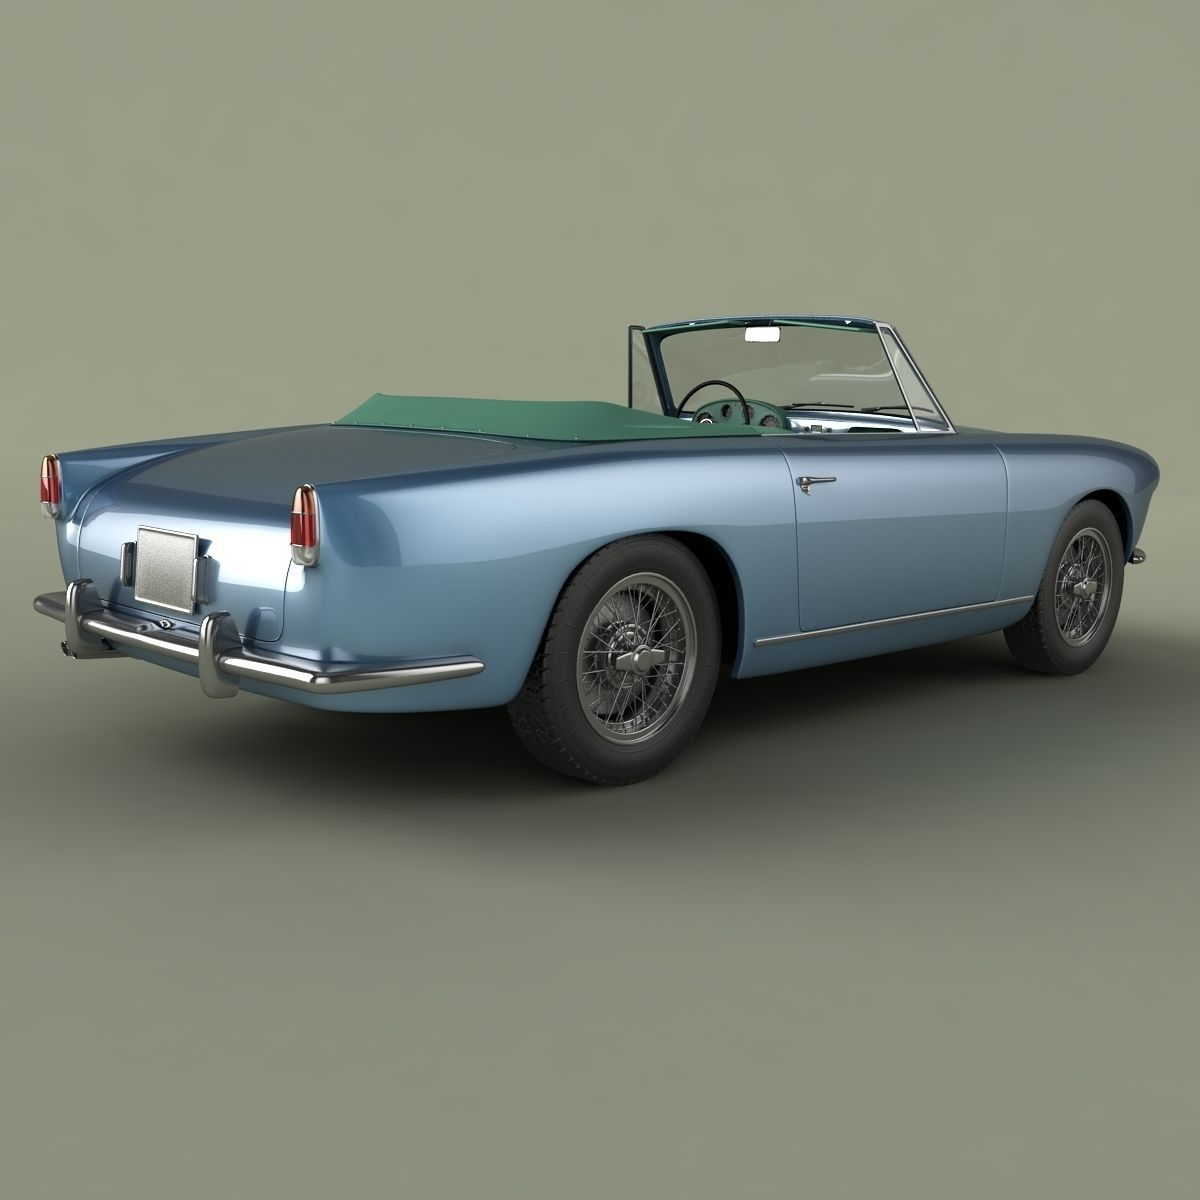 alfa romeo 1900 ss cabrio 3d model max obj 3ds. Black Bedroom Furniture Sets. Home Design Ideas